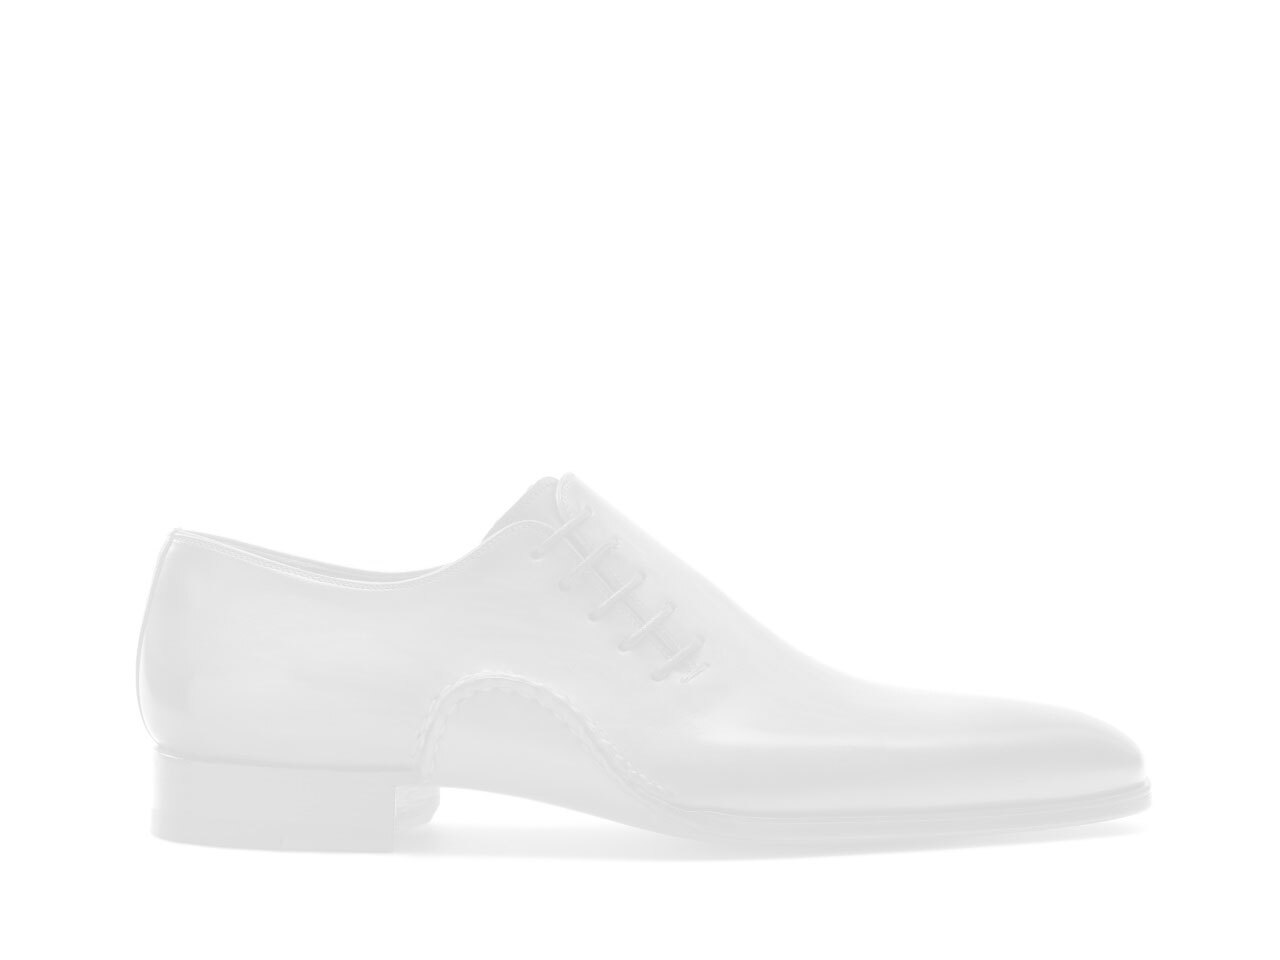 Pair of the Magnanni Cruz II Black Patent Men's Oxford Shoes